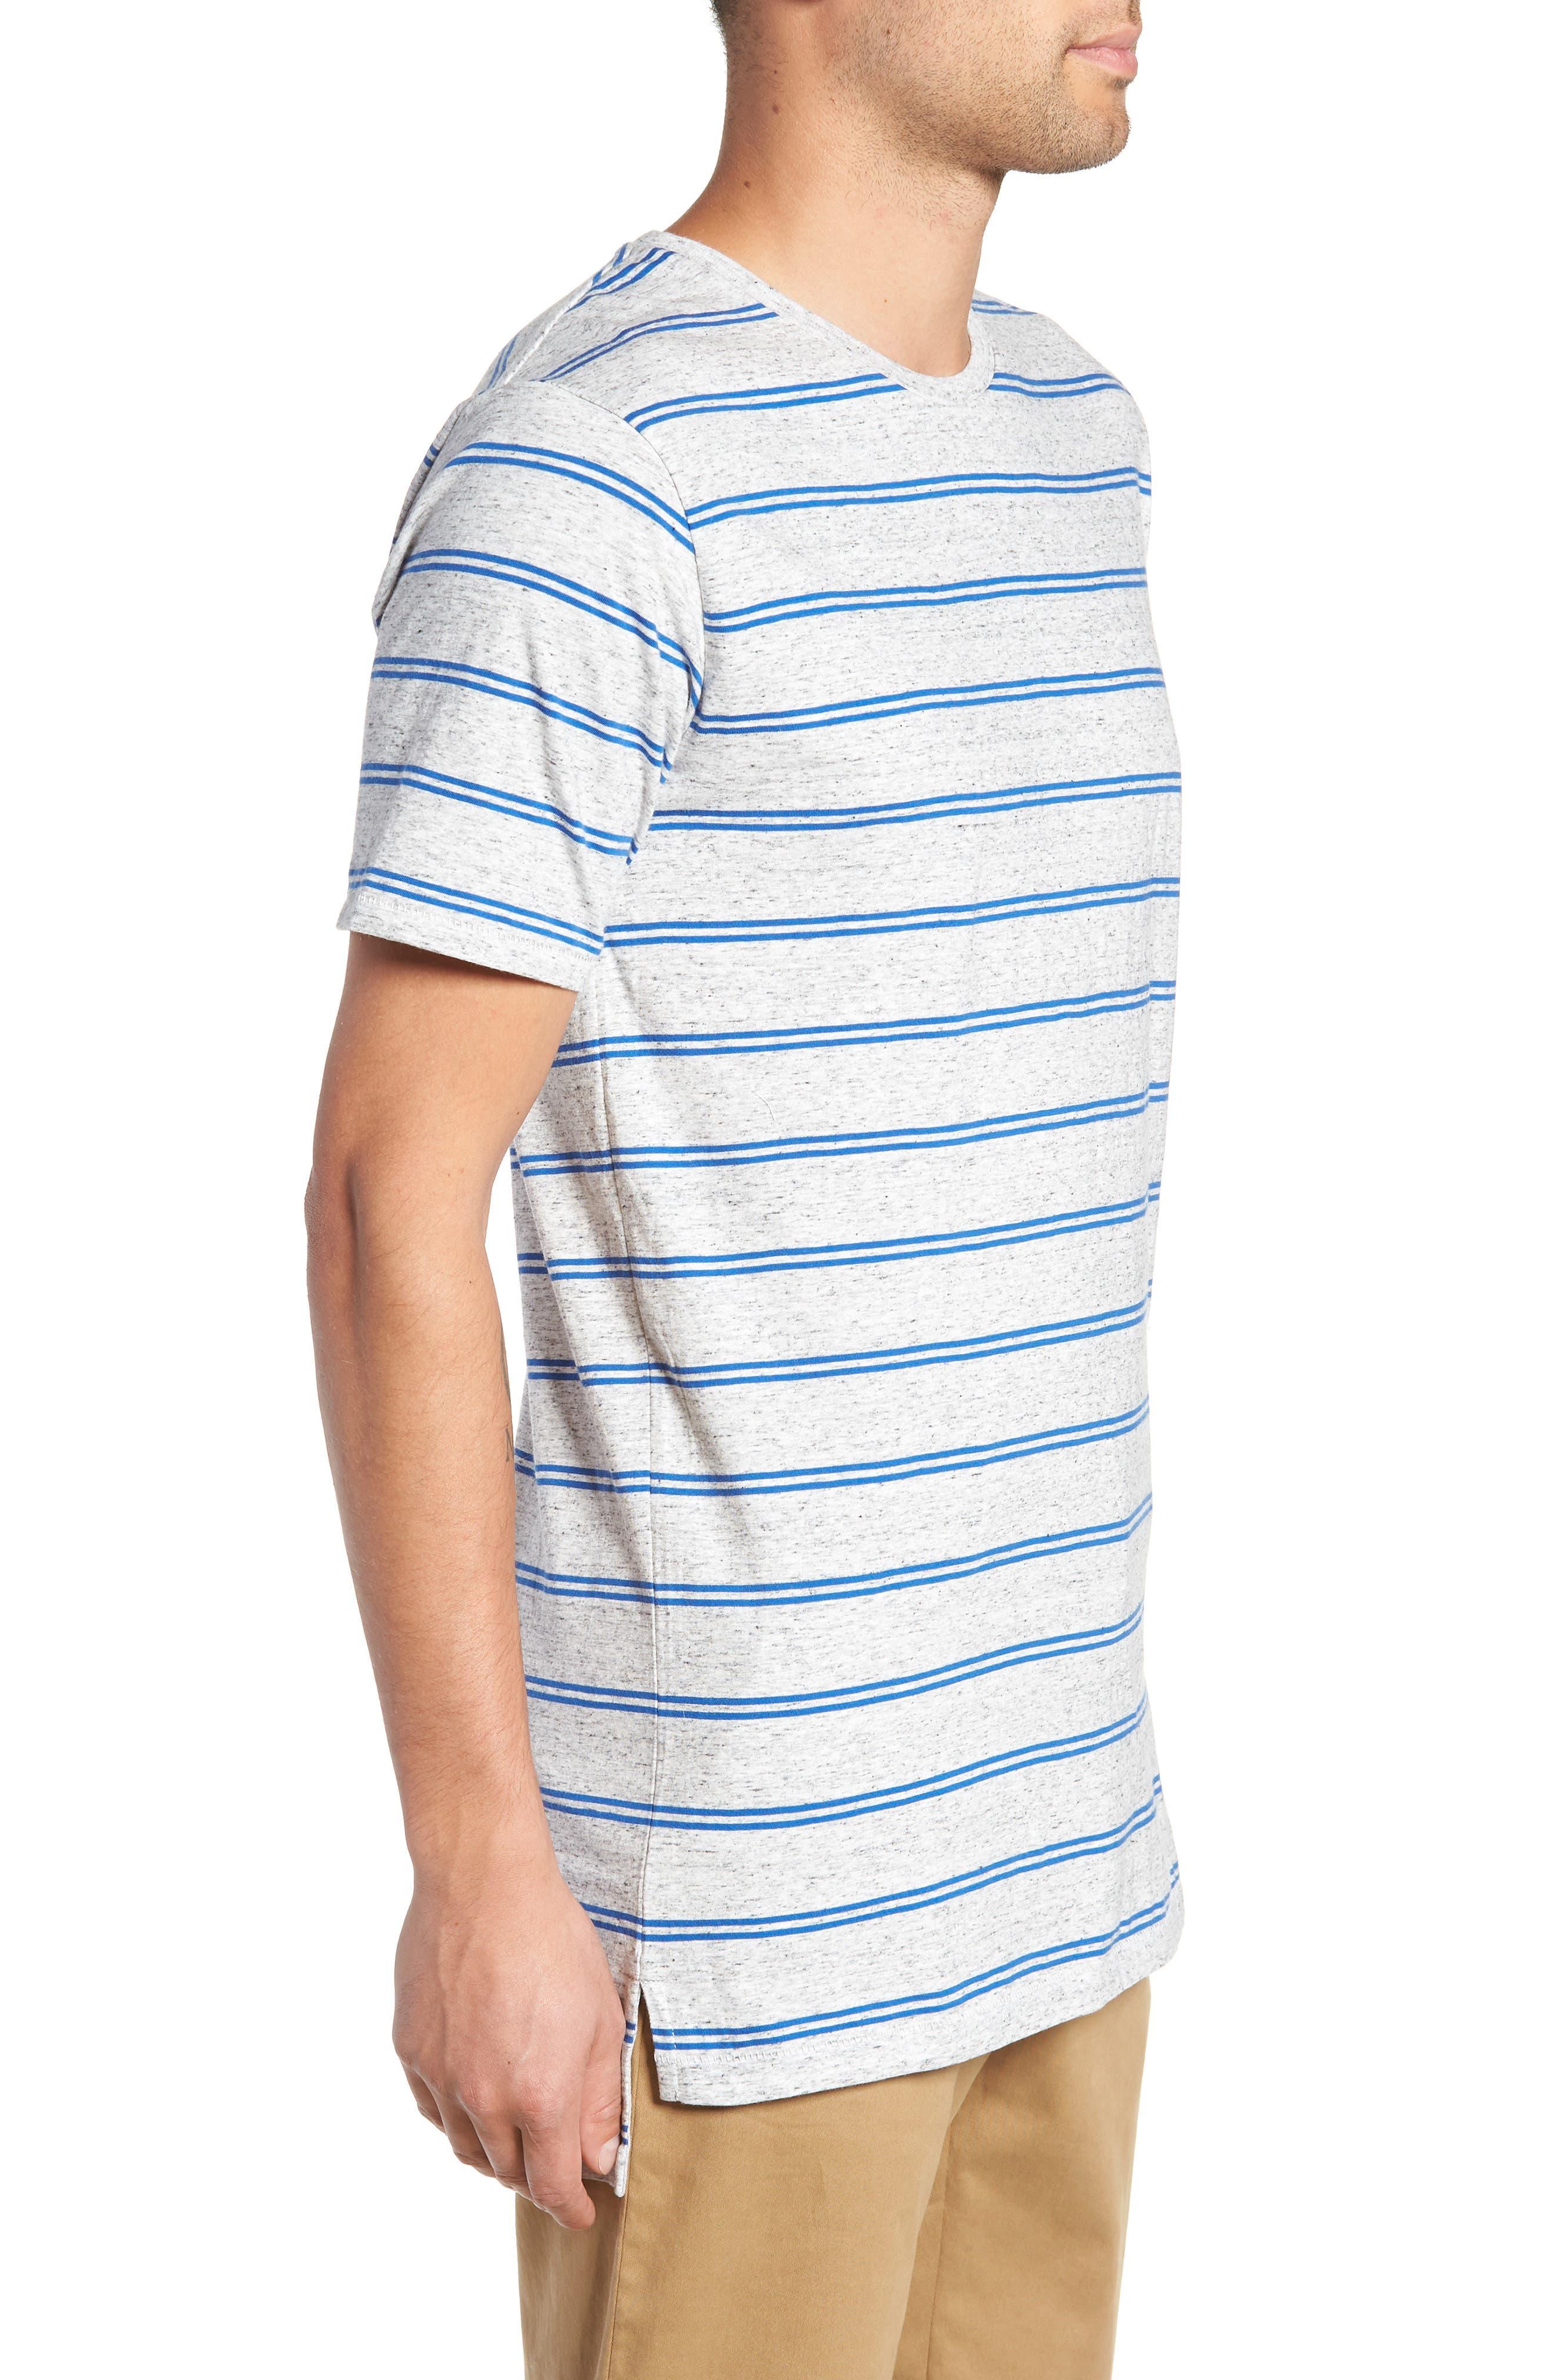 Flintlock T-Shirt,                             Alternate thumbnail 3, color,                             STORM MARLE/ COBALT